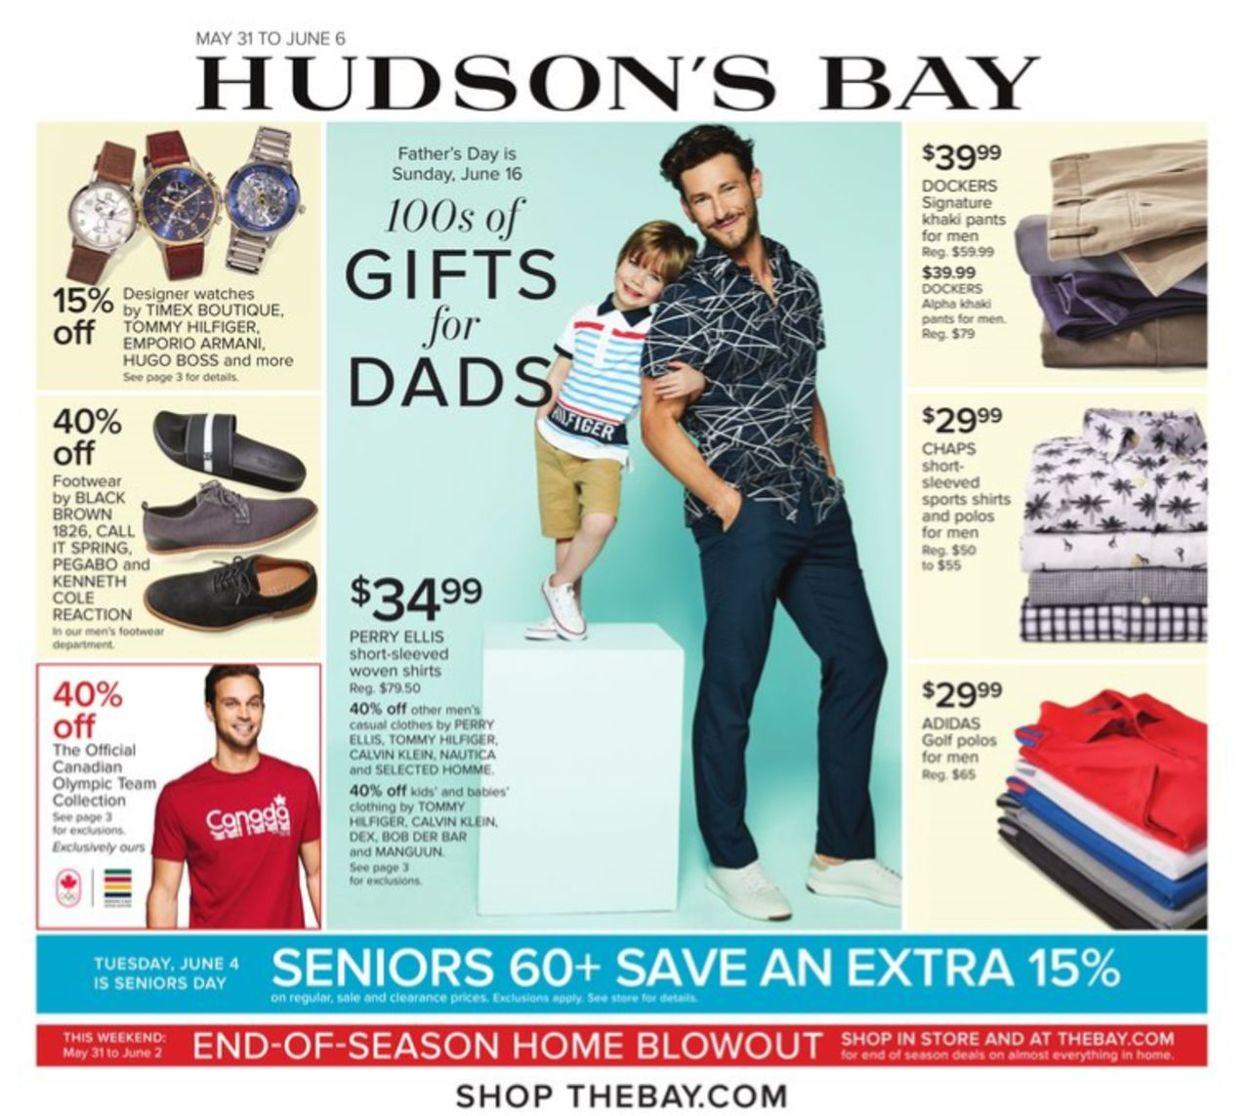 Hudson's Bay Flyer - 05/31-06/06/2019